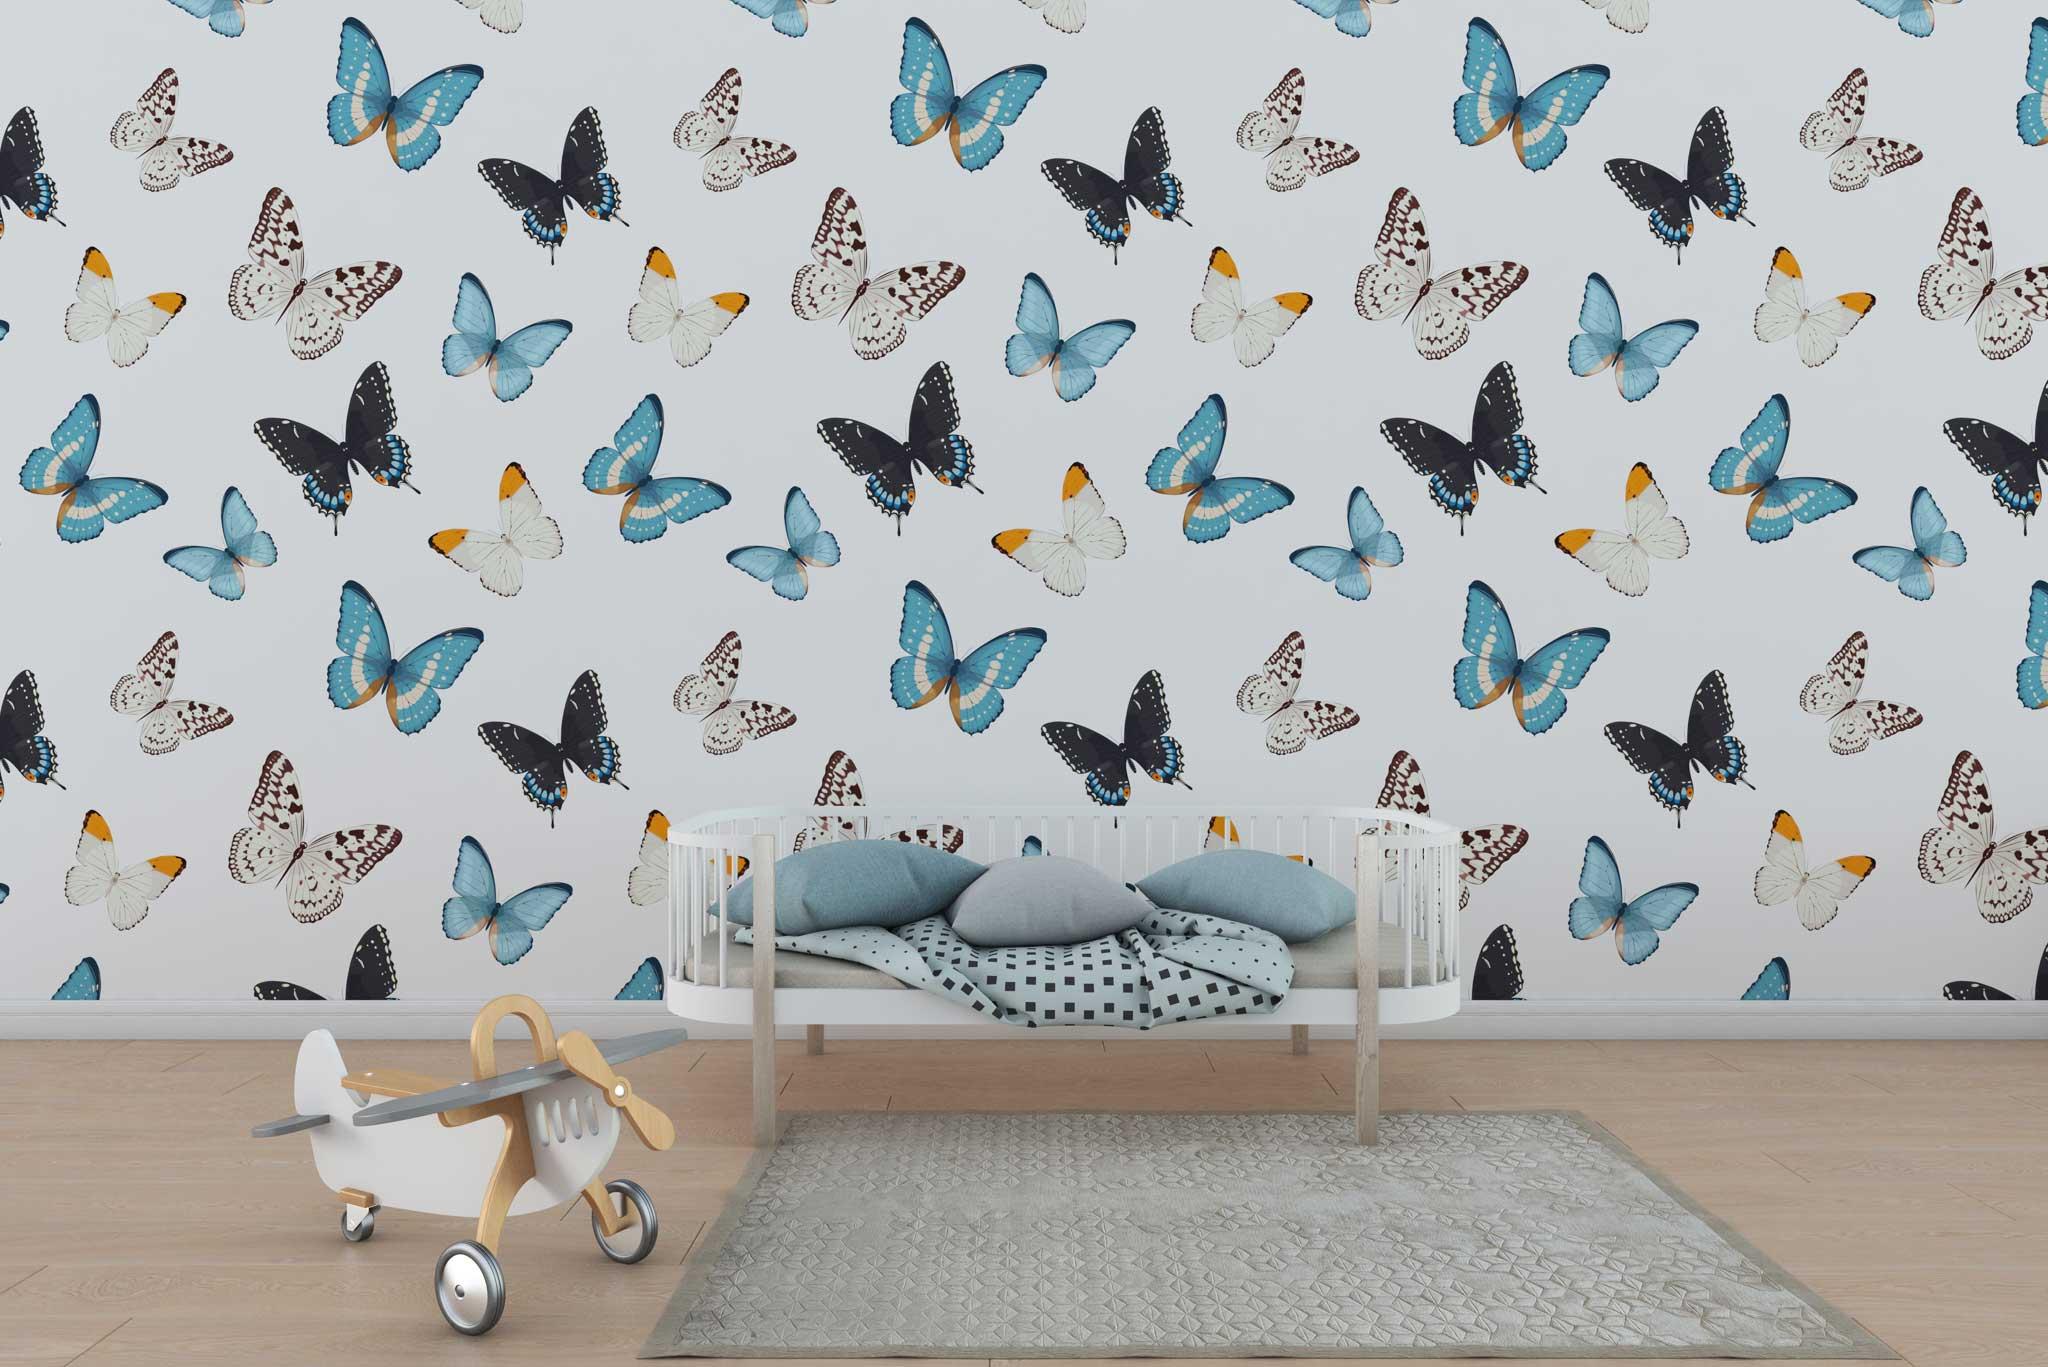 tapet-fototapet-design-personalizat-customizabil-comanda-special-camera-dormitor-copii-model-repetitiv-fluturi-albastri-fundal-alb